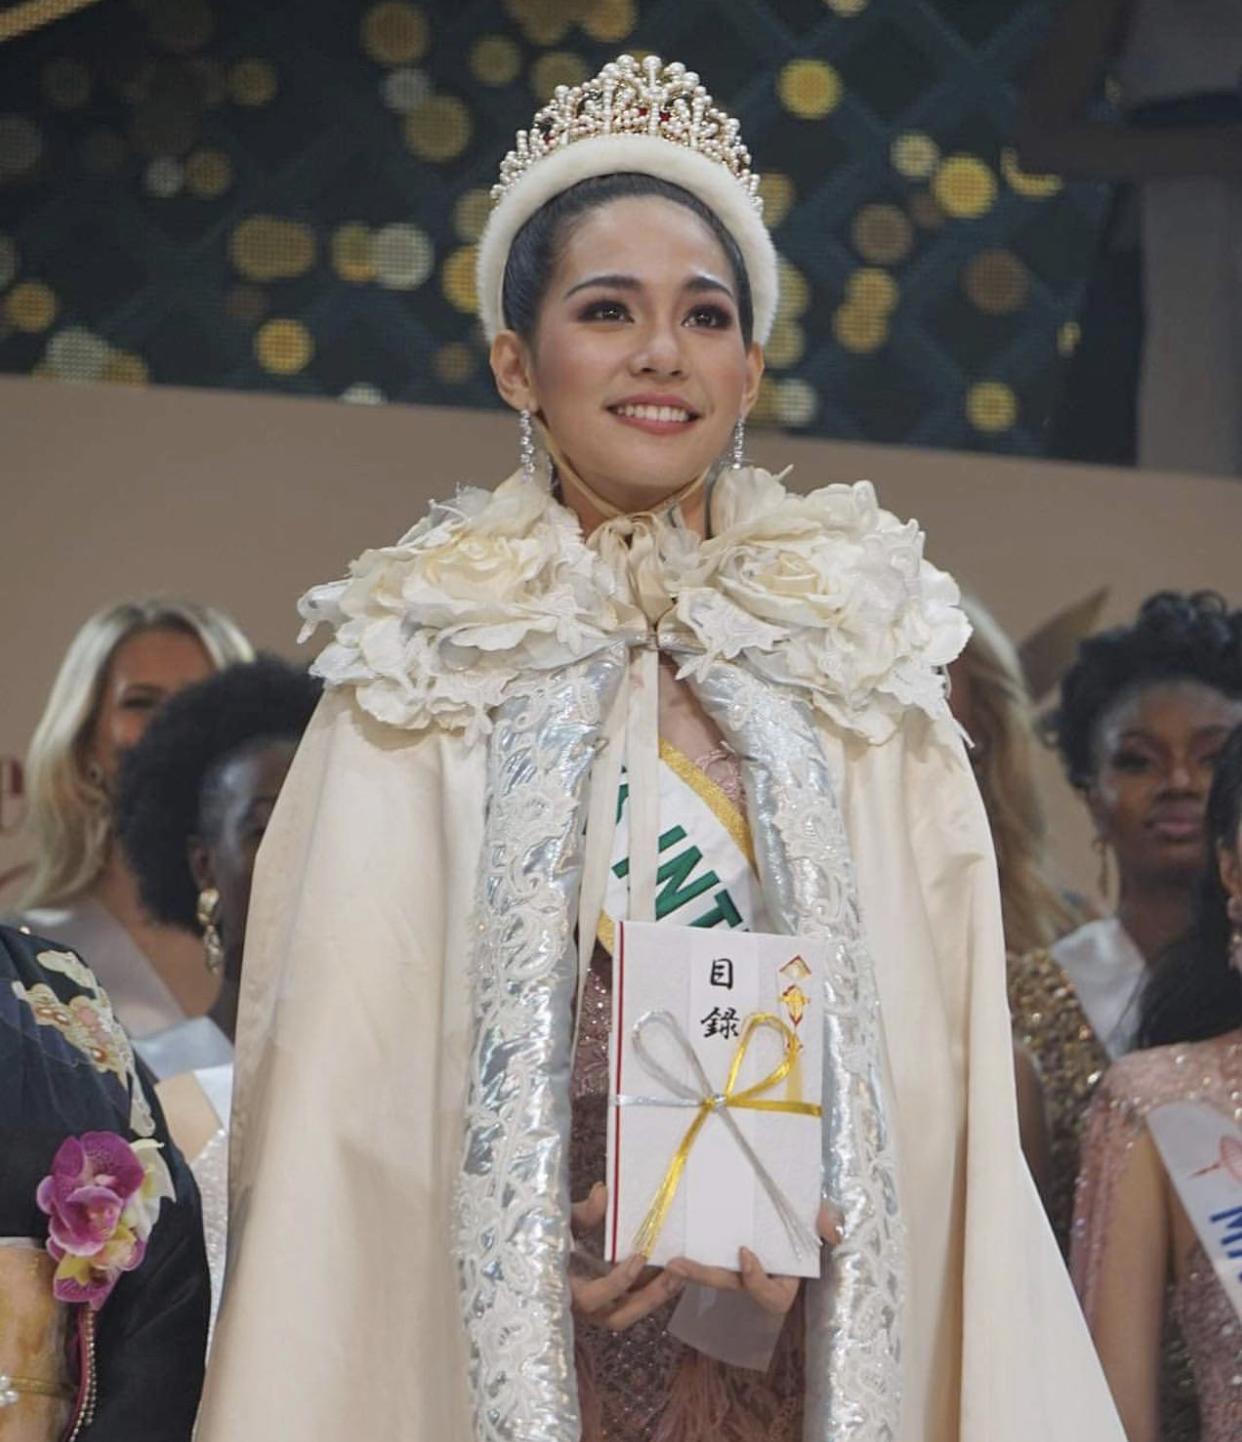 Official Thread of MISS INTERNATIONAL 2019 : Sireethorn Leearamwat of THAILAND 9bd15aa9-c917-4495-8946-ac43ba16ad11